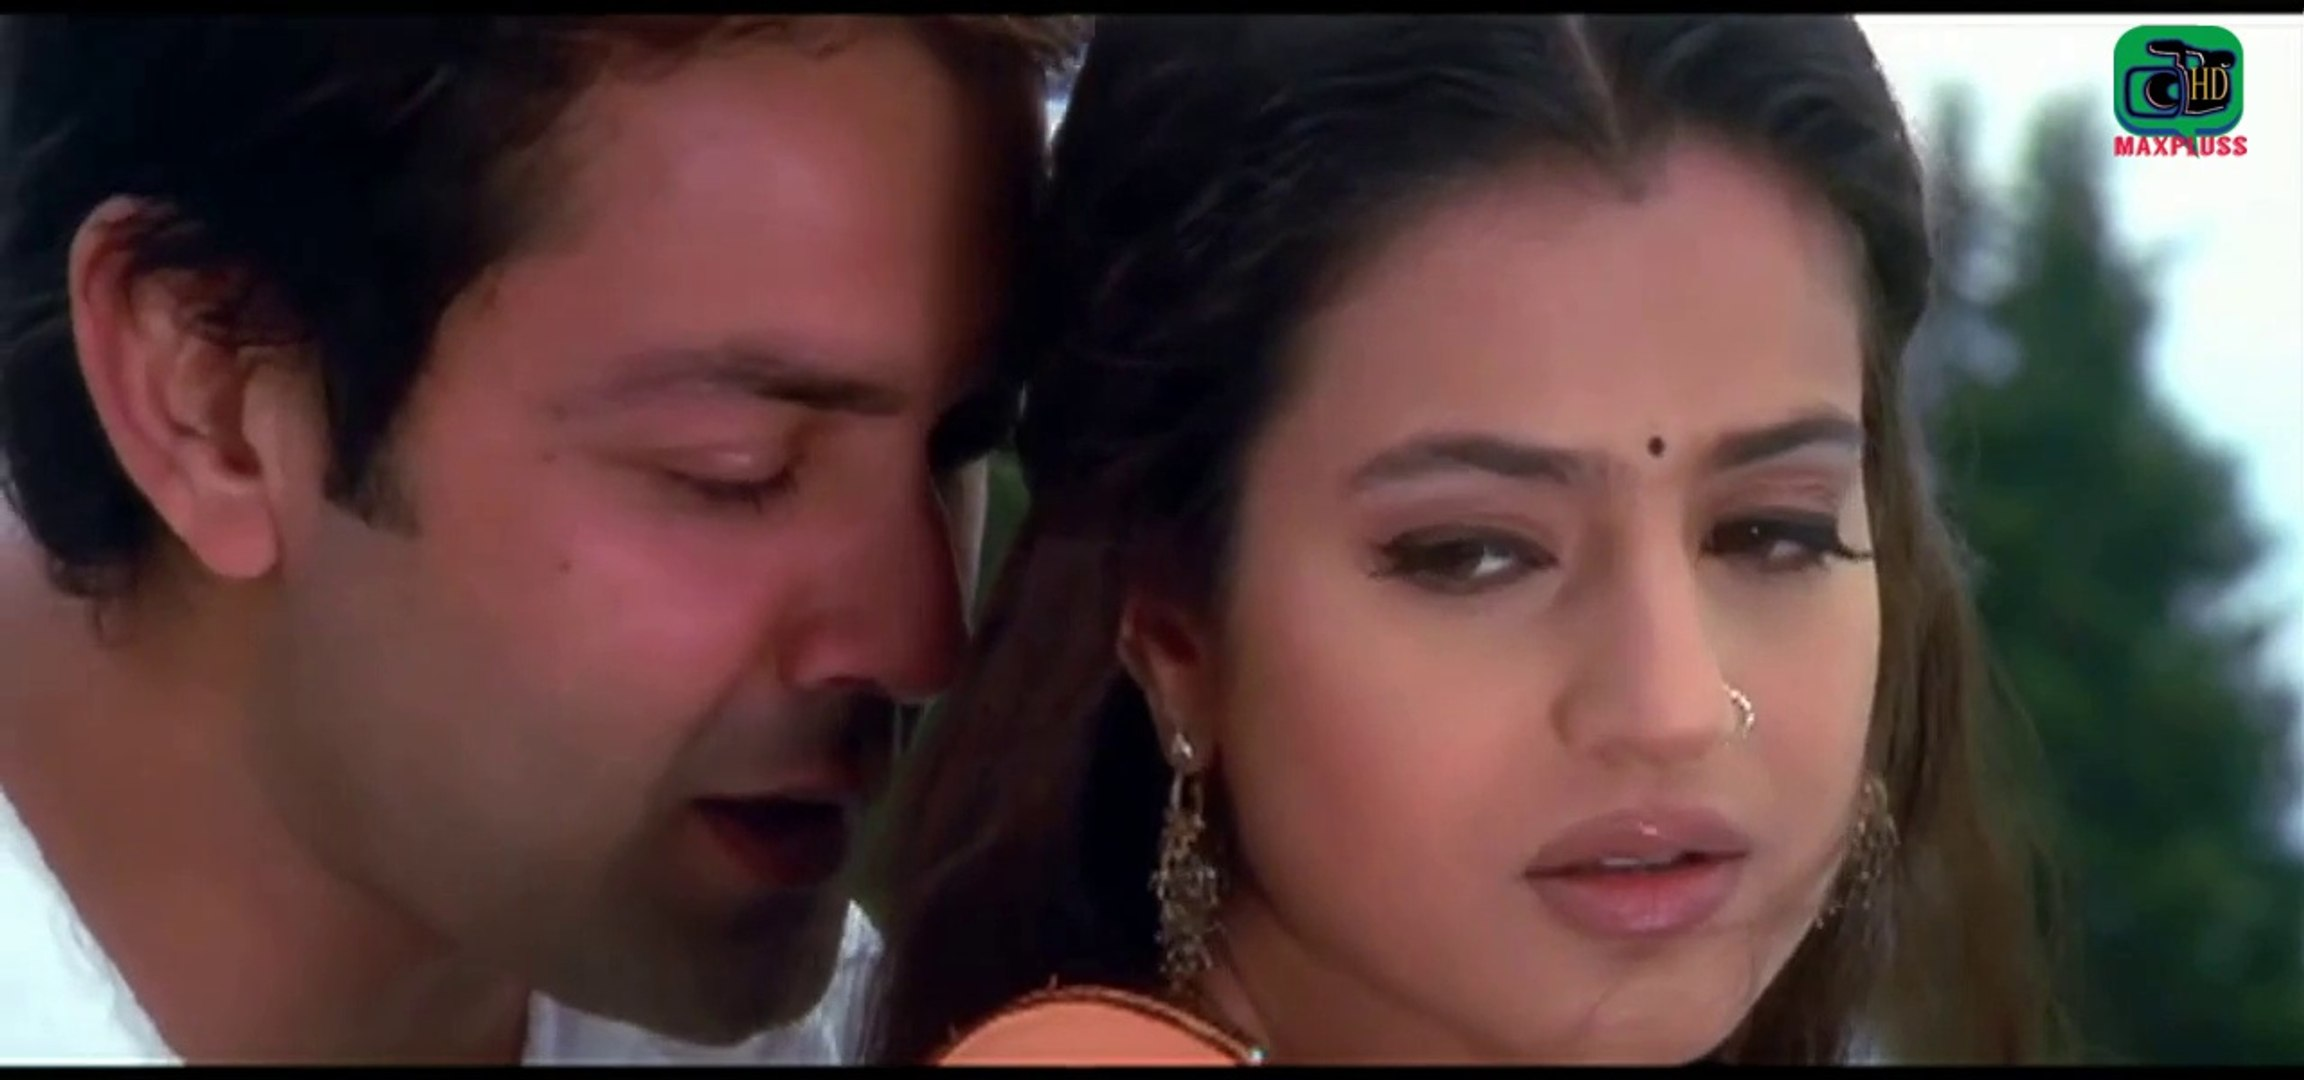 Kaise Tumhe Bataun   Full Video Song   HD-720p   Humko Tumse Pyaar Hai   Amisha Patel-Bobby Deol   M